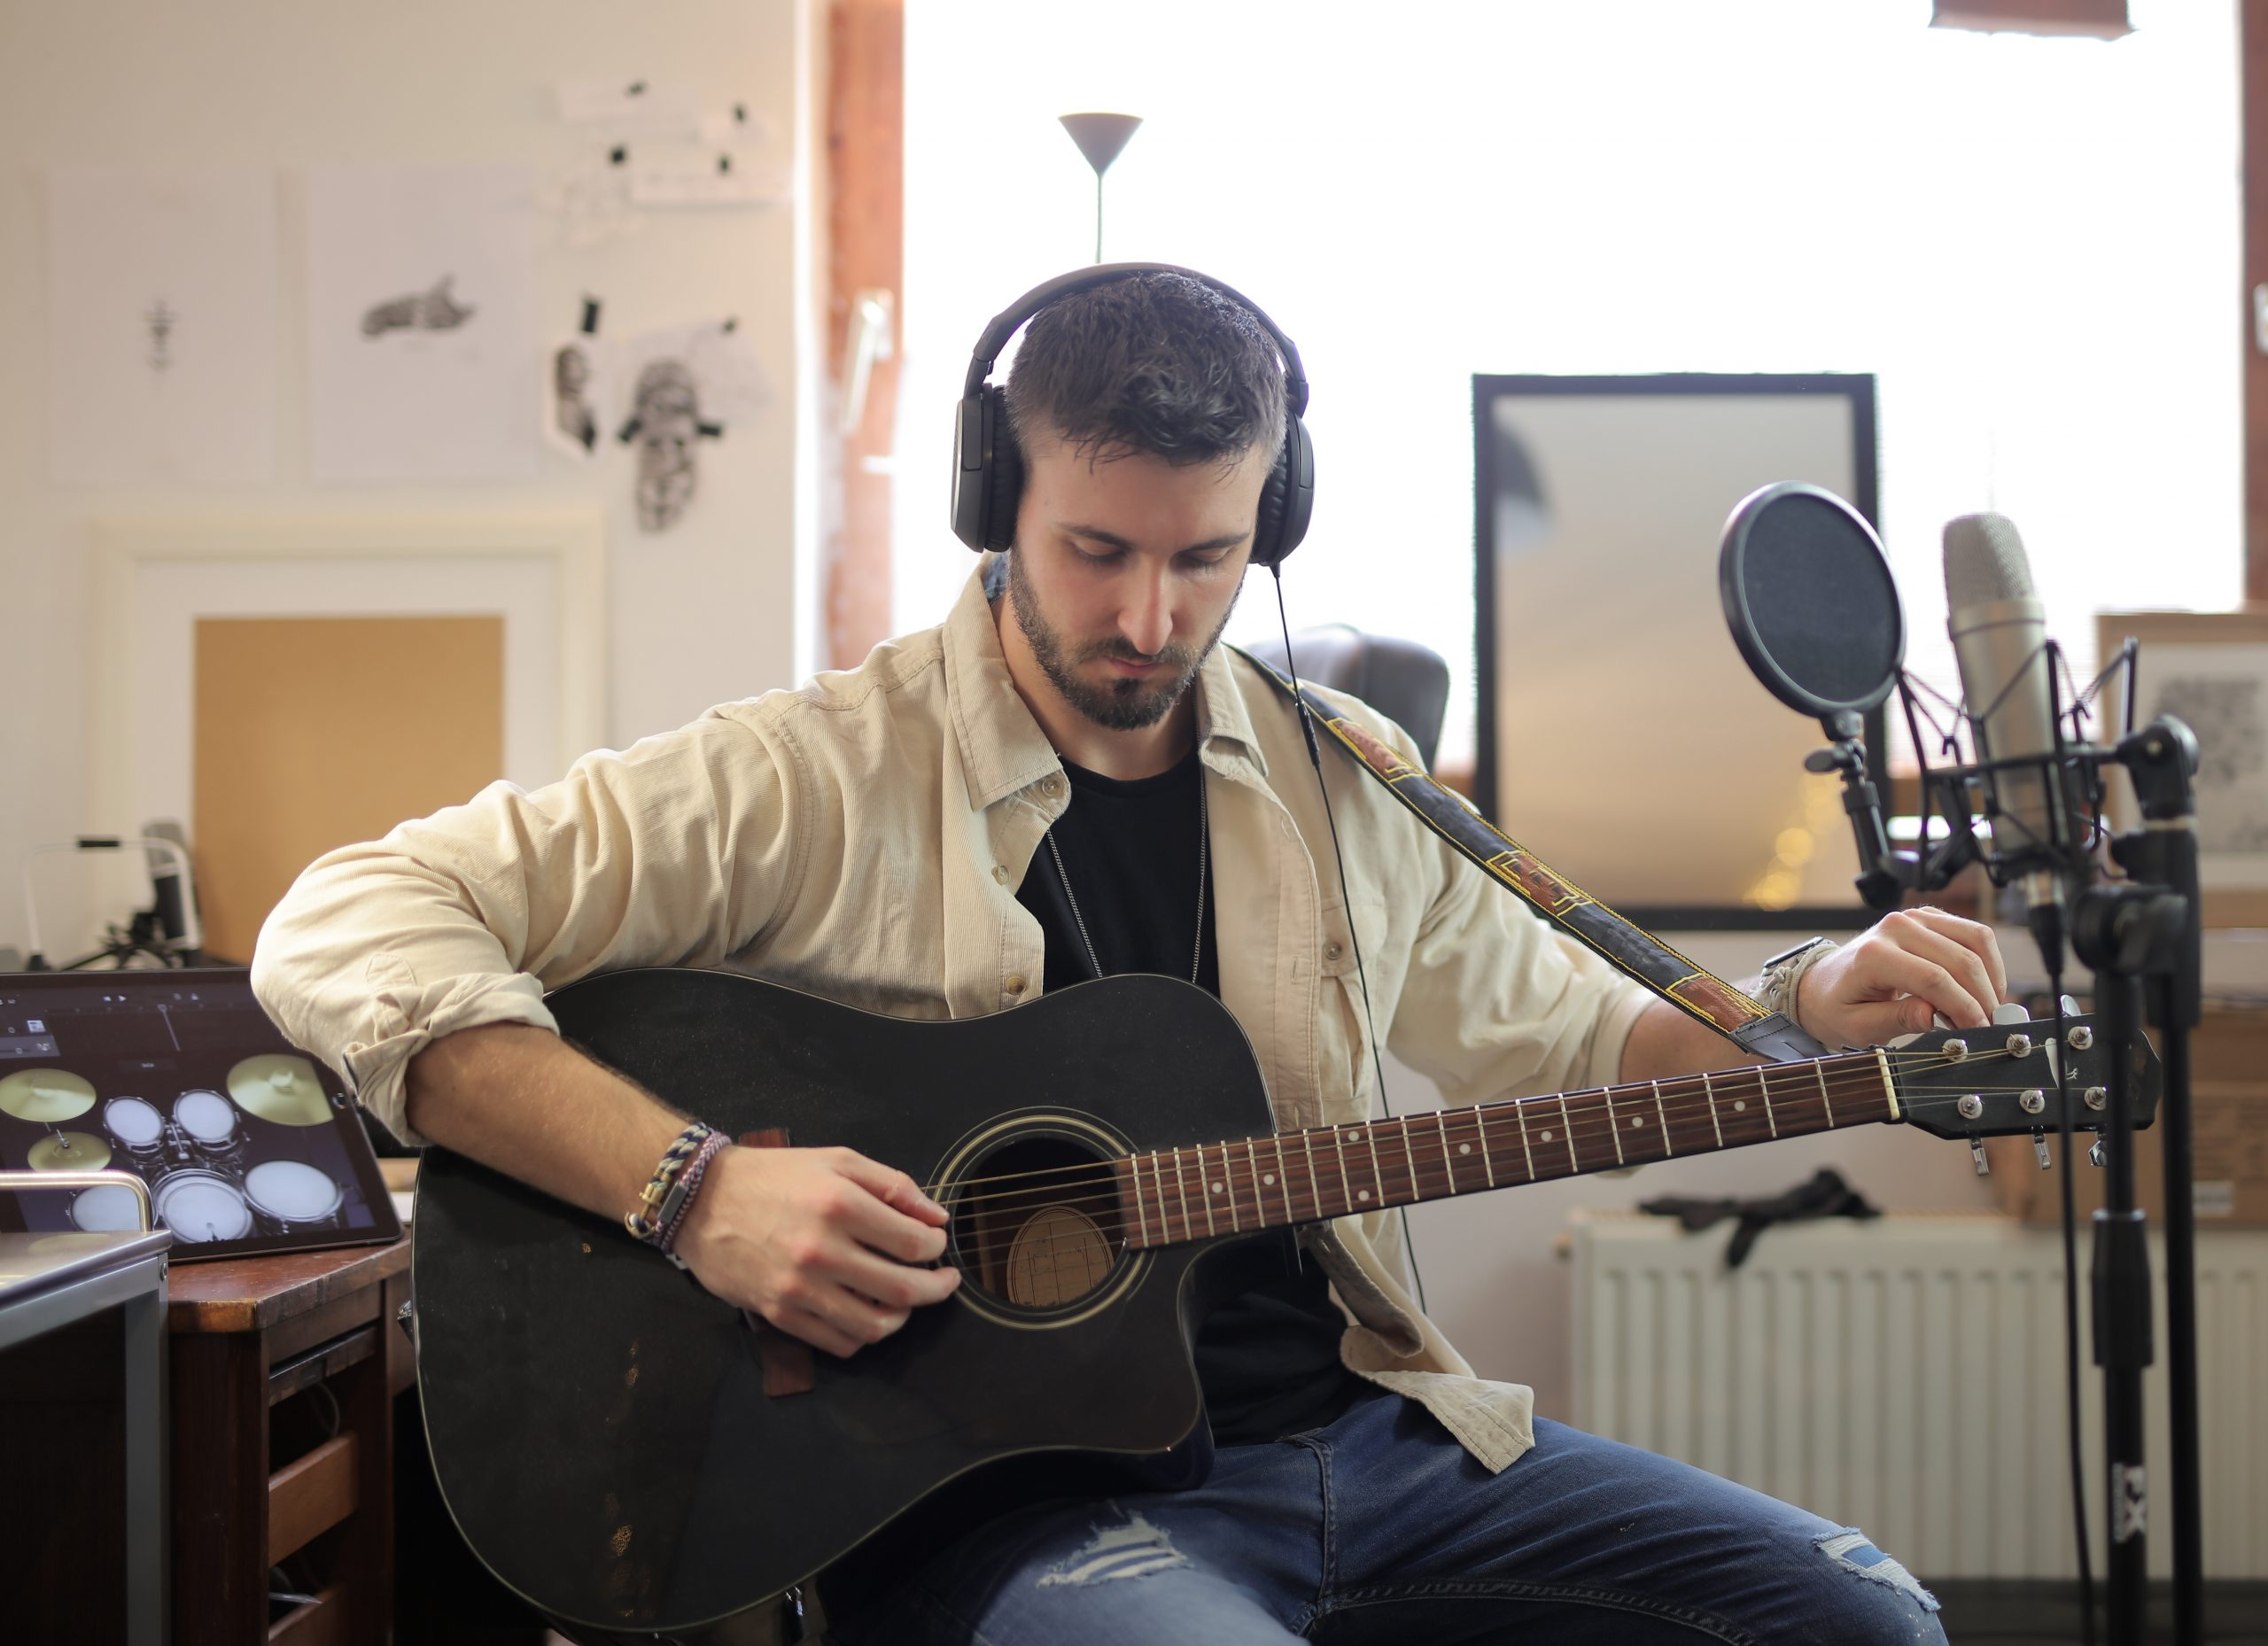 Man in beige dress shirt tuning acoustic guitar